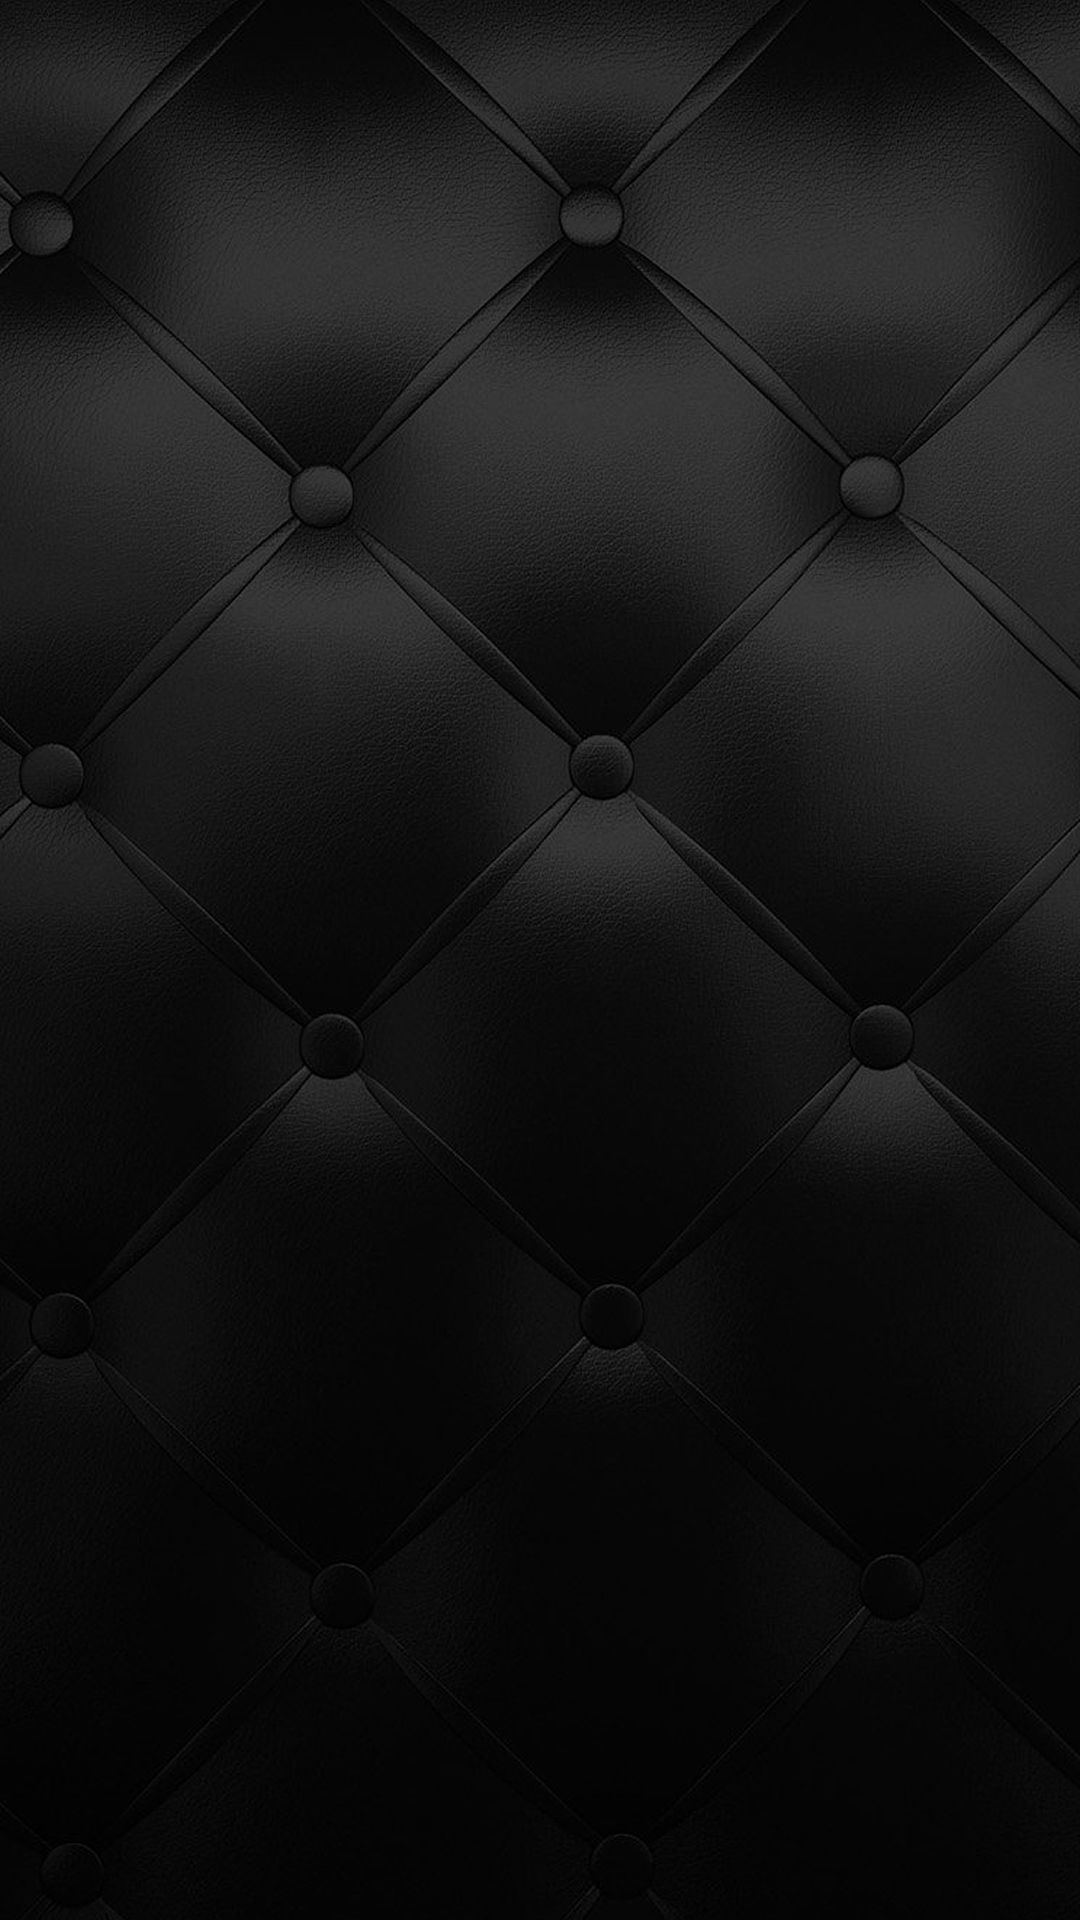 Wallpaper iphone 6 black - Sofa Black Texture Pattern Iphone 6 Plus Wallpaper